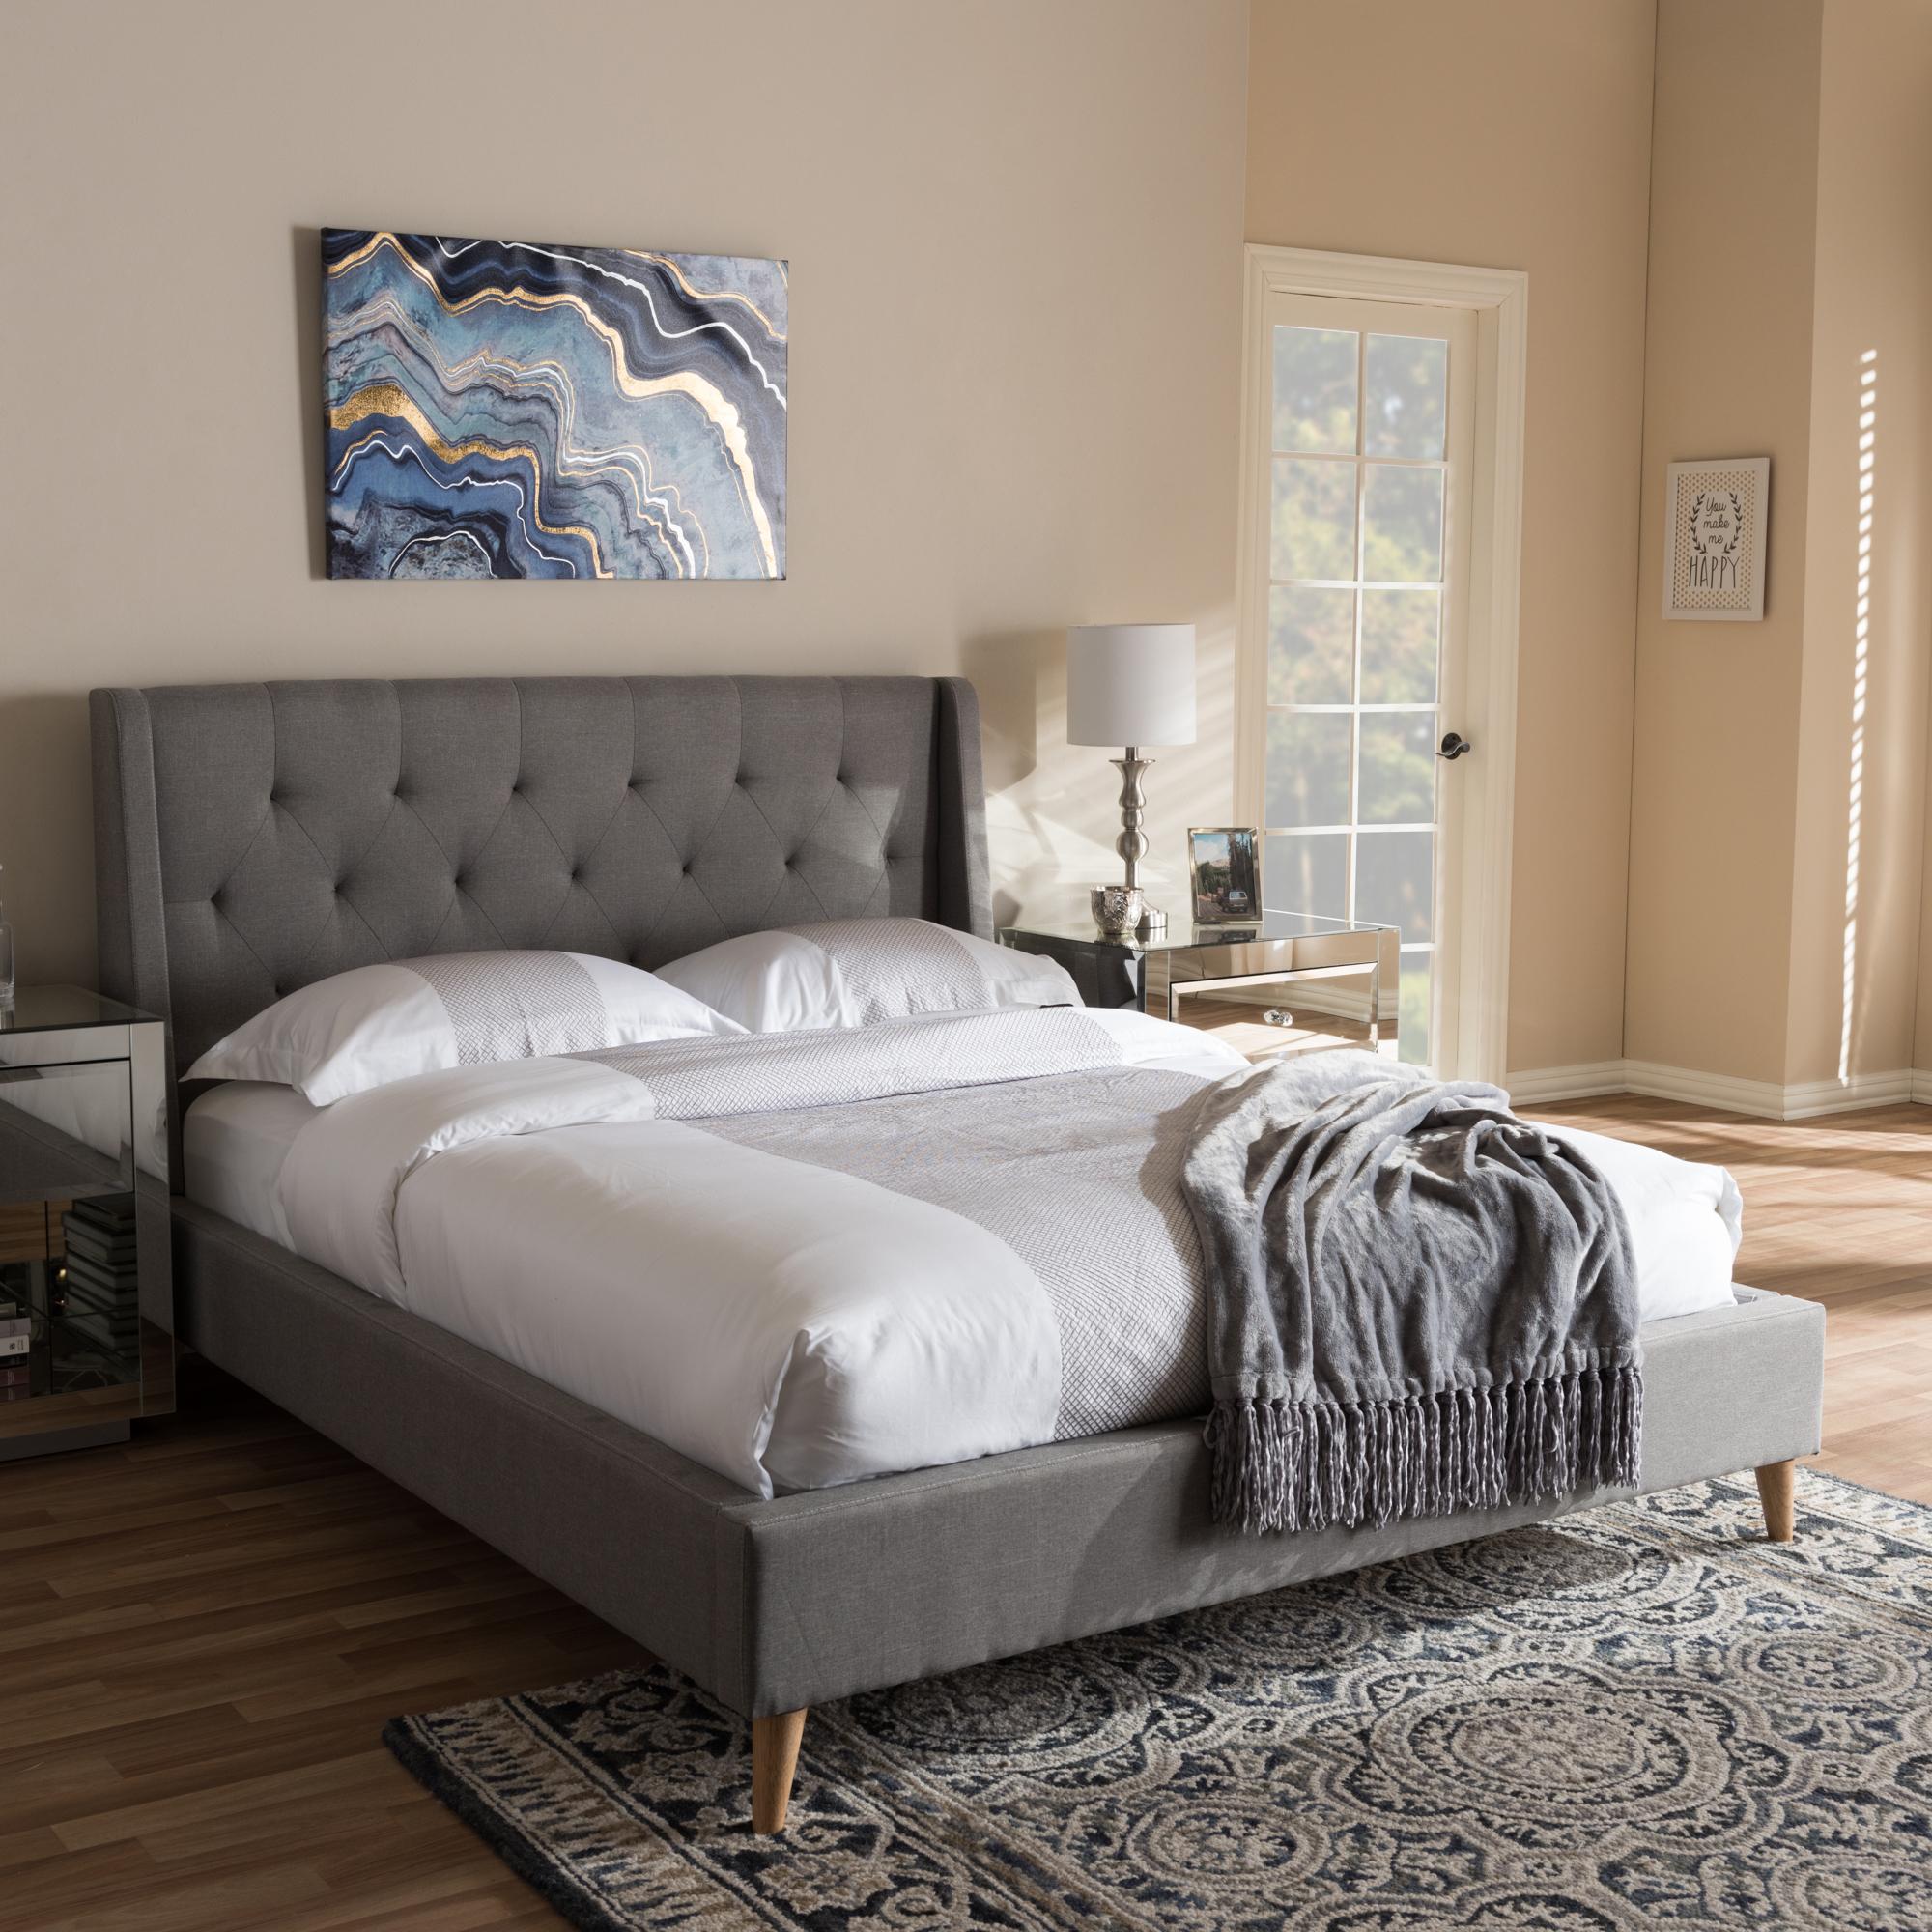 ... Baxton Studio Adelaide Retro Modern Light Grey Fabric Upholstered Queen  Size Platform Bed   CF8862  ...